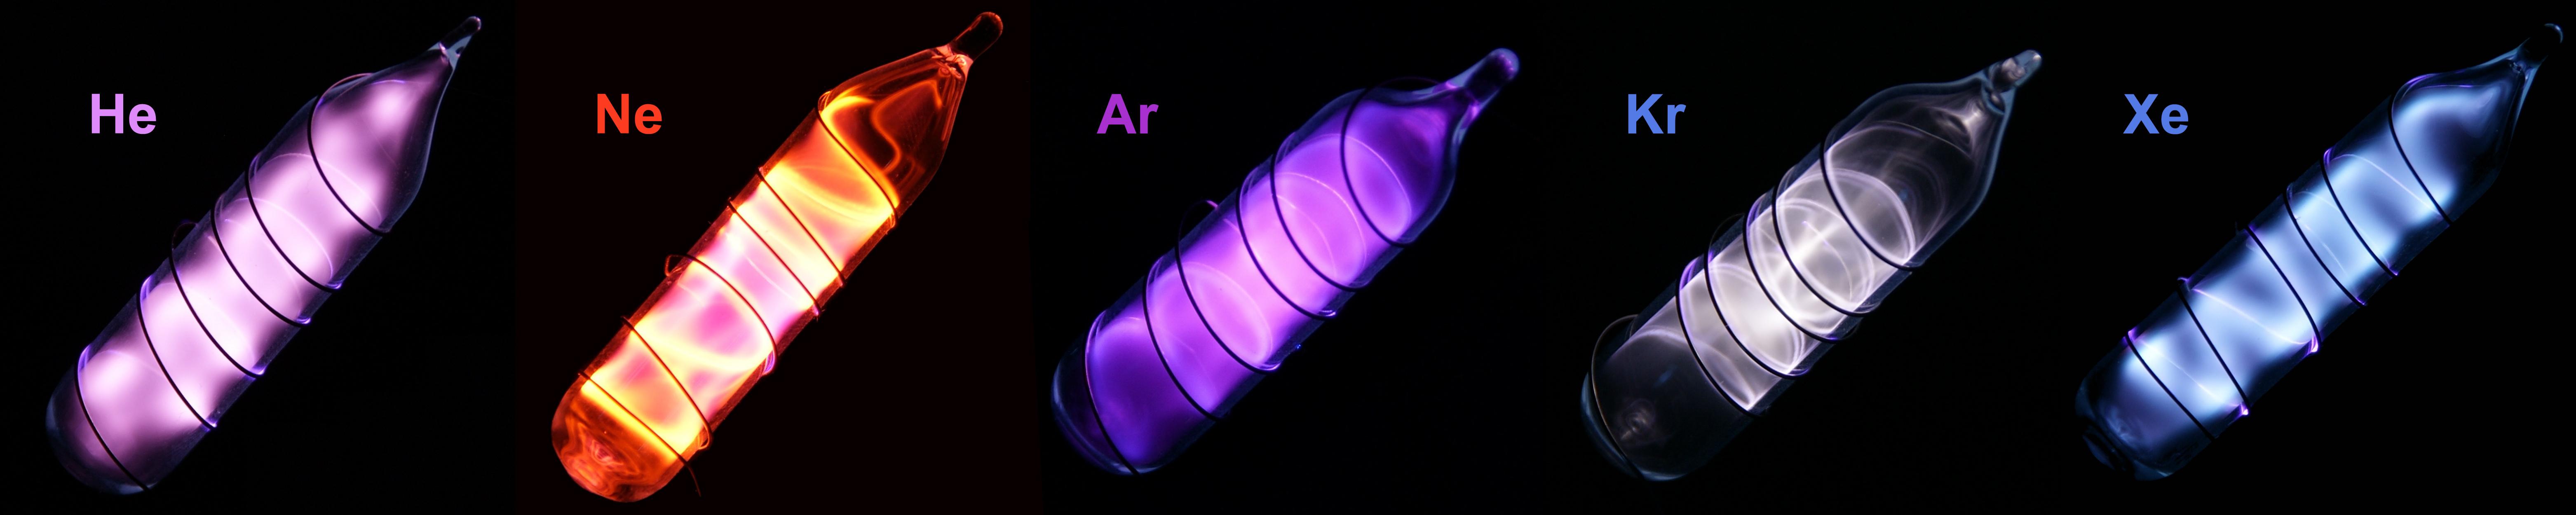 helium lamp photo - 2